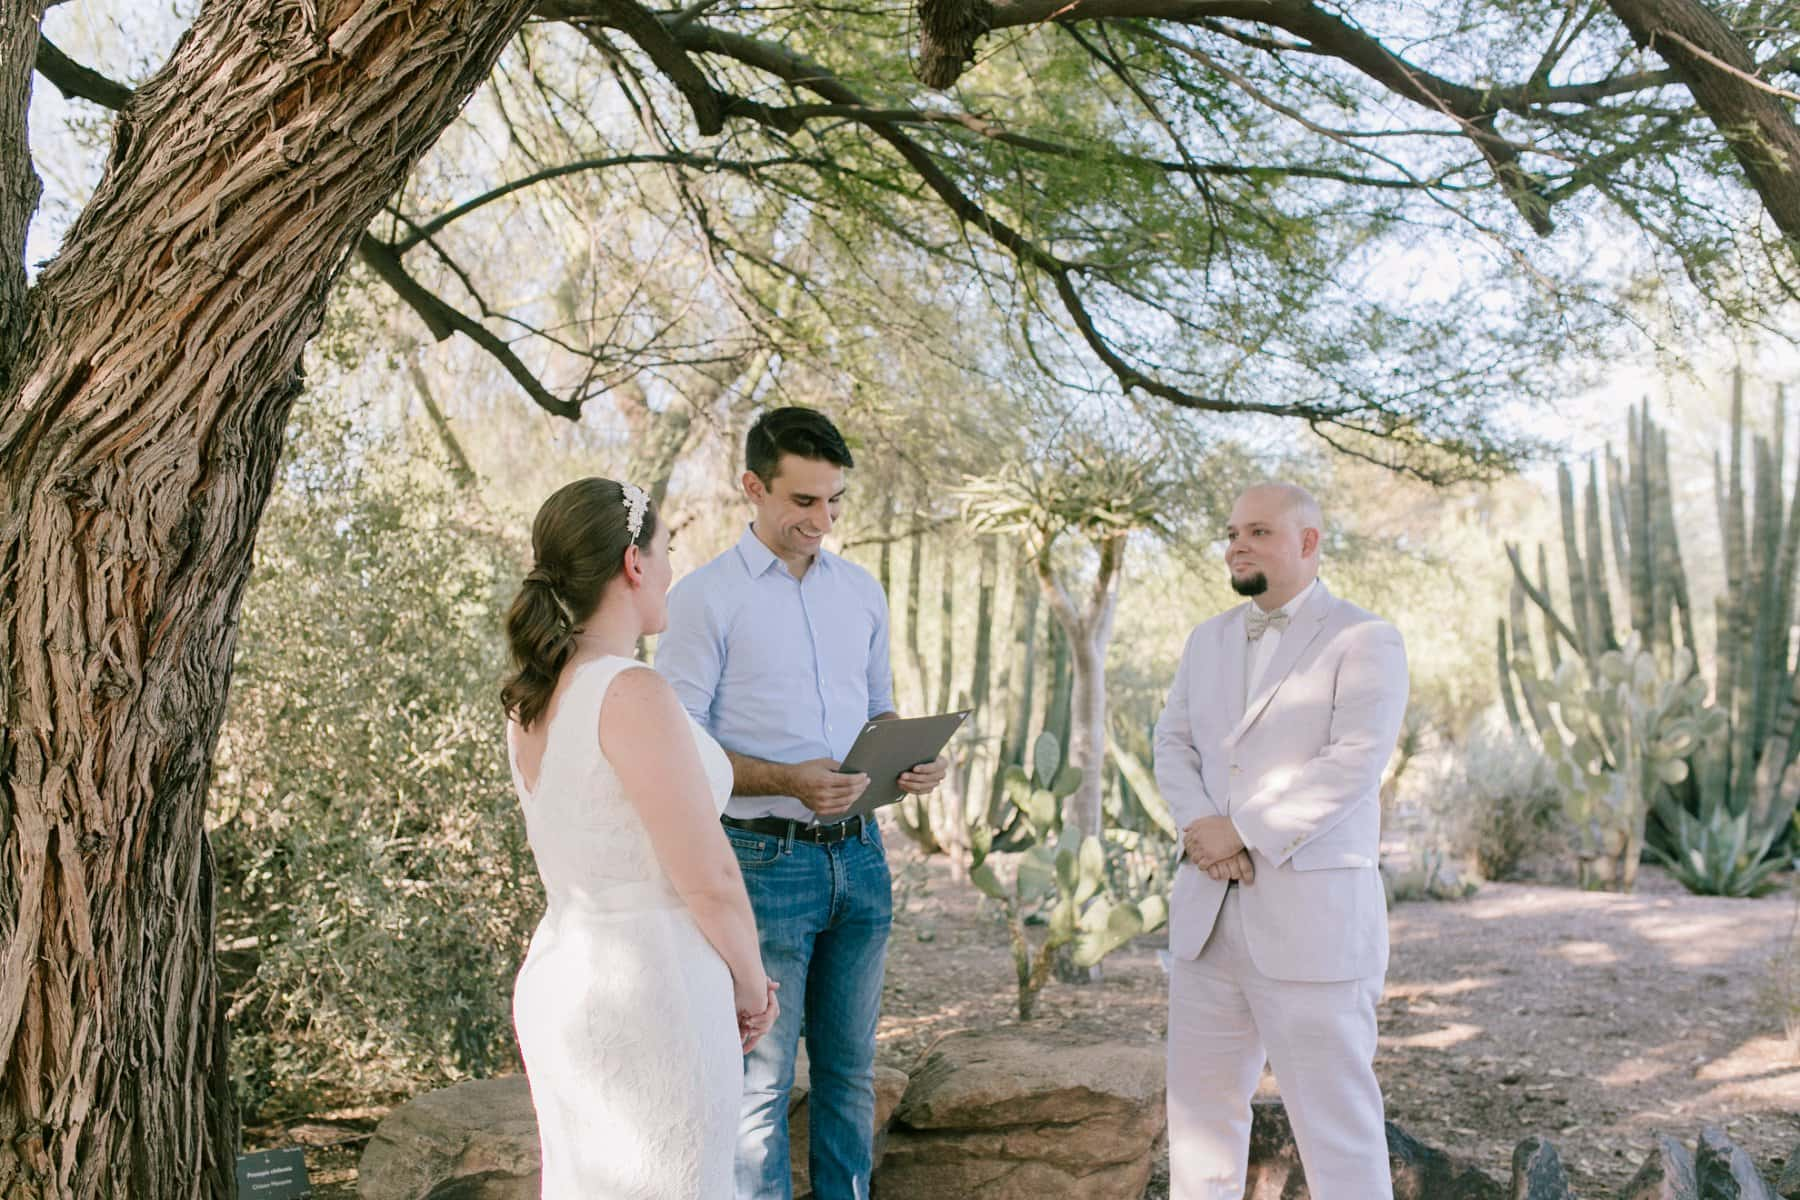 elopement at Desert Botanical Gardens in Phoenix